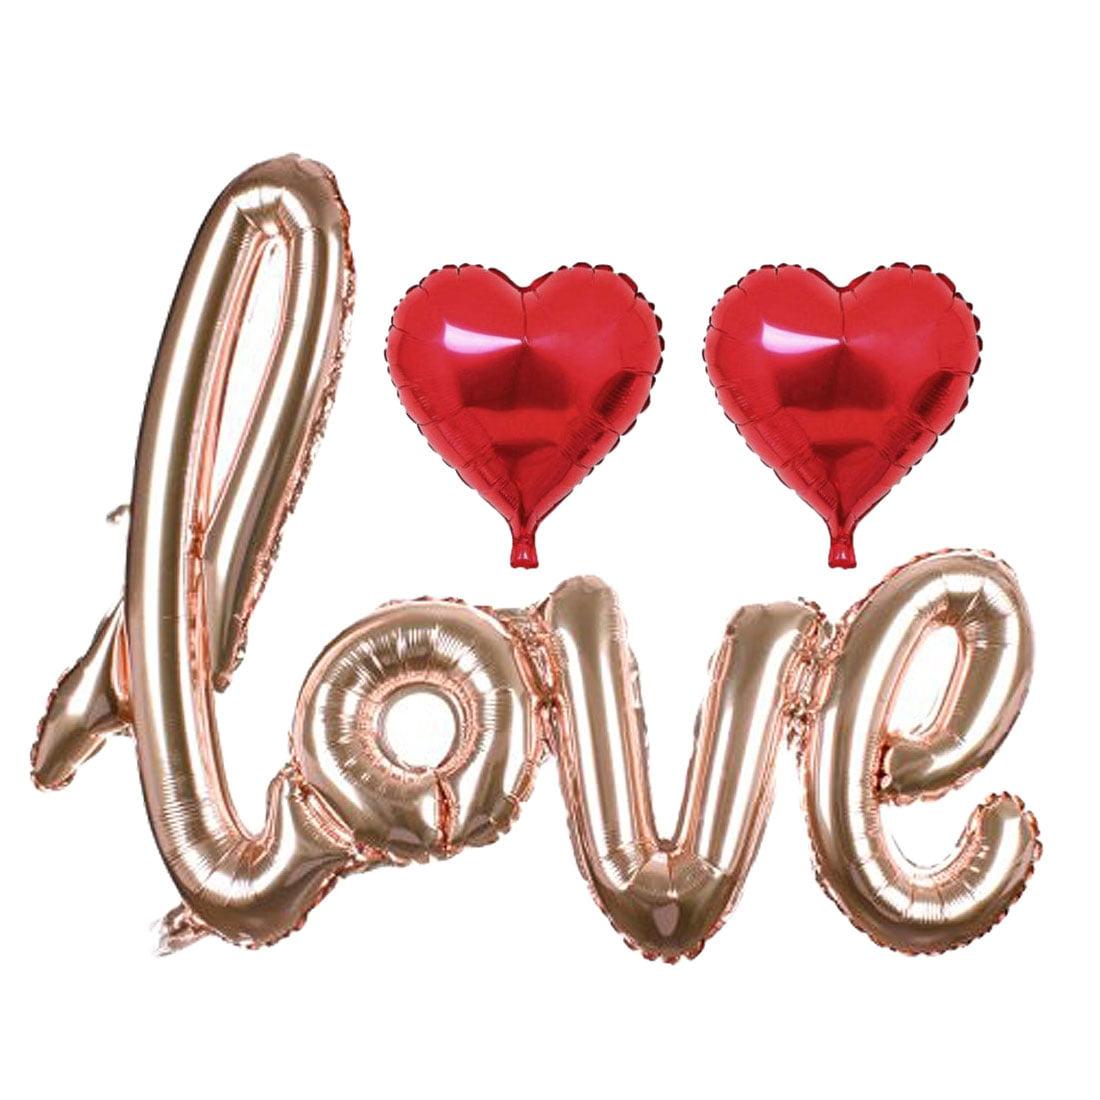 Unique Bargains Foil LOVE Heart Balloon Wedding Anniversary Decor Rose Gold Red